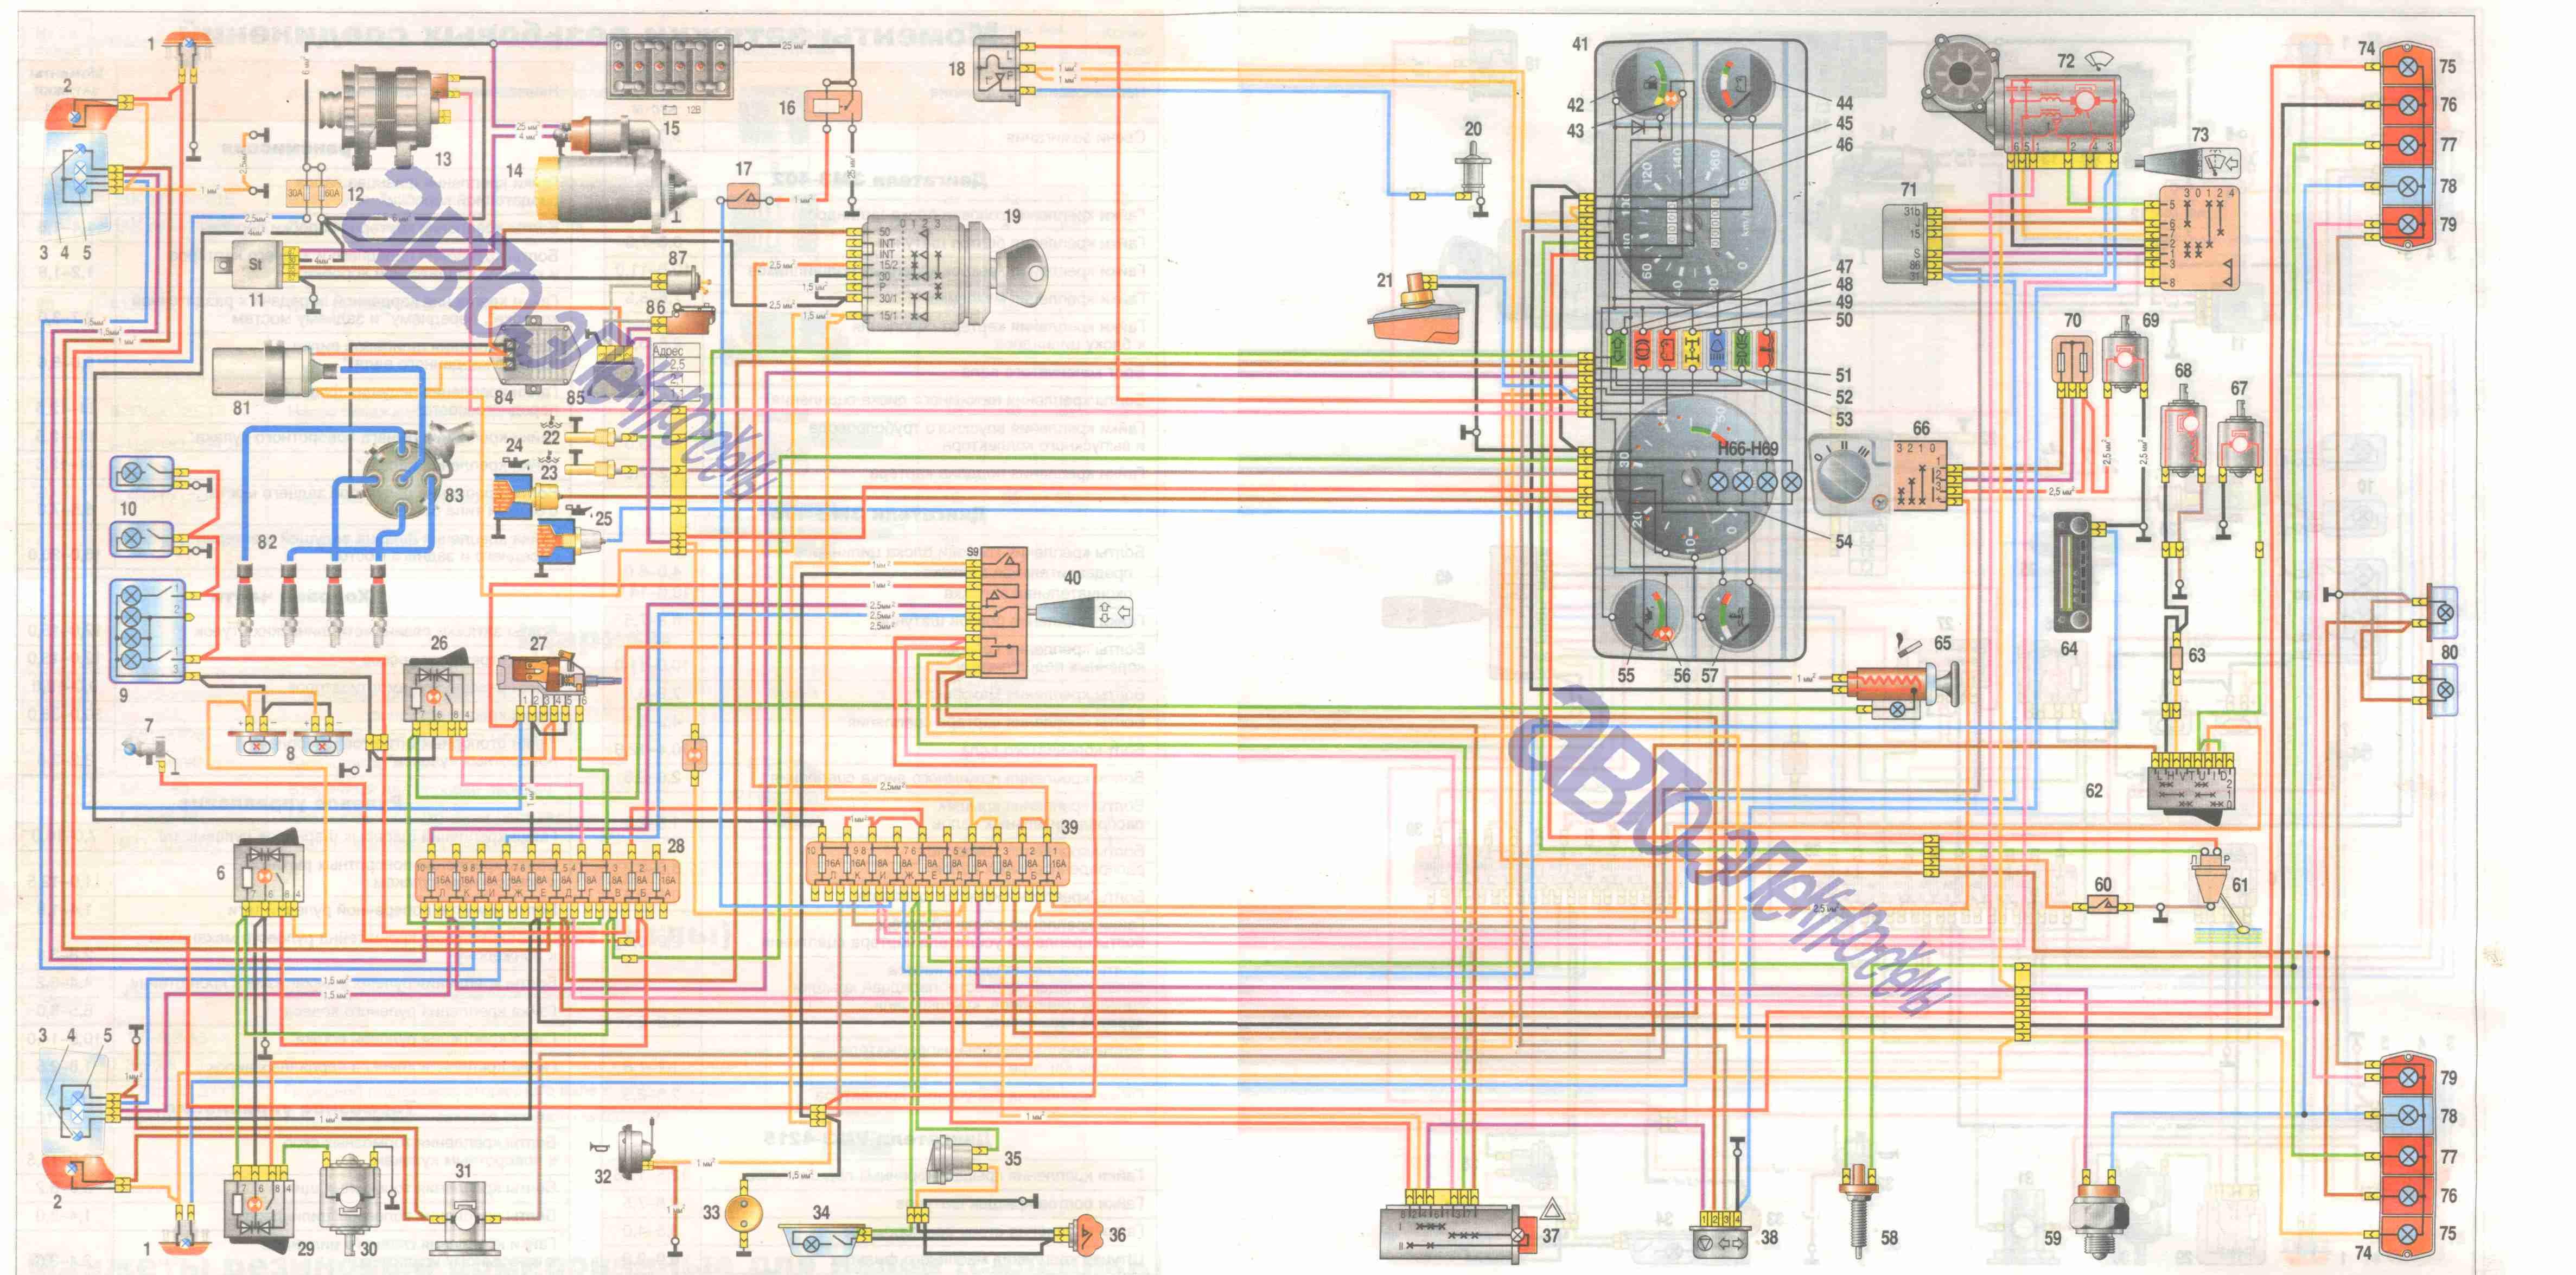 схема электрооборудования двигателем змз 402